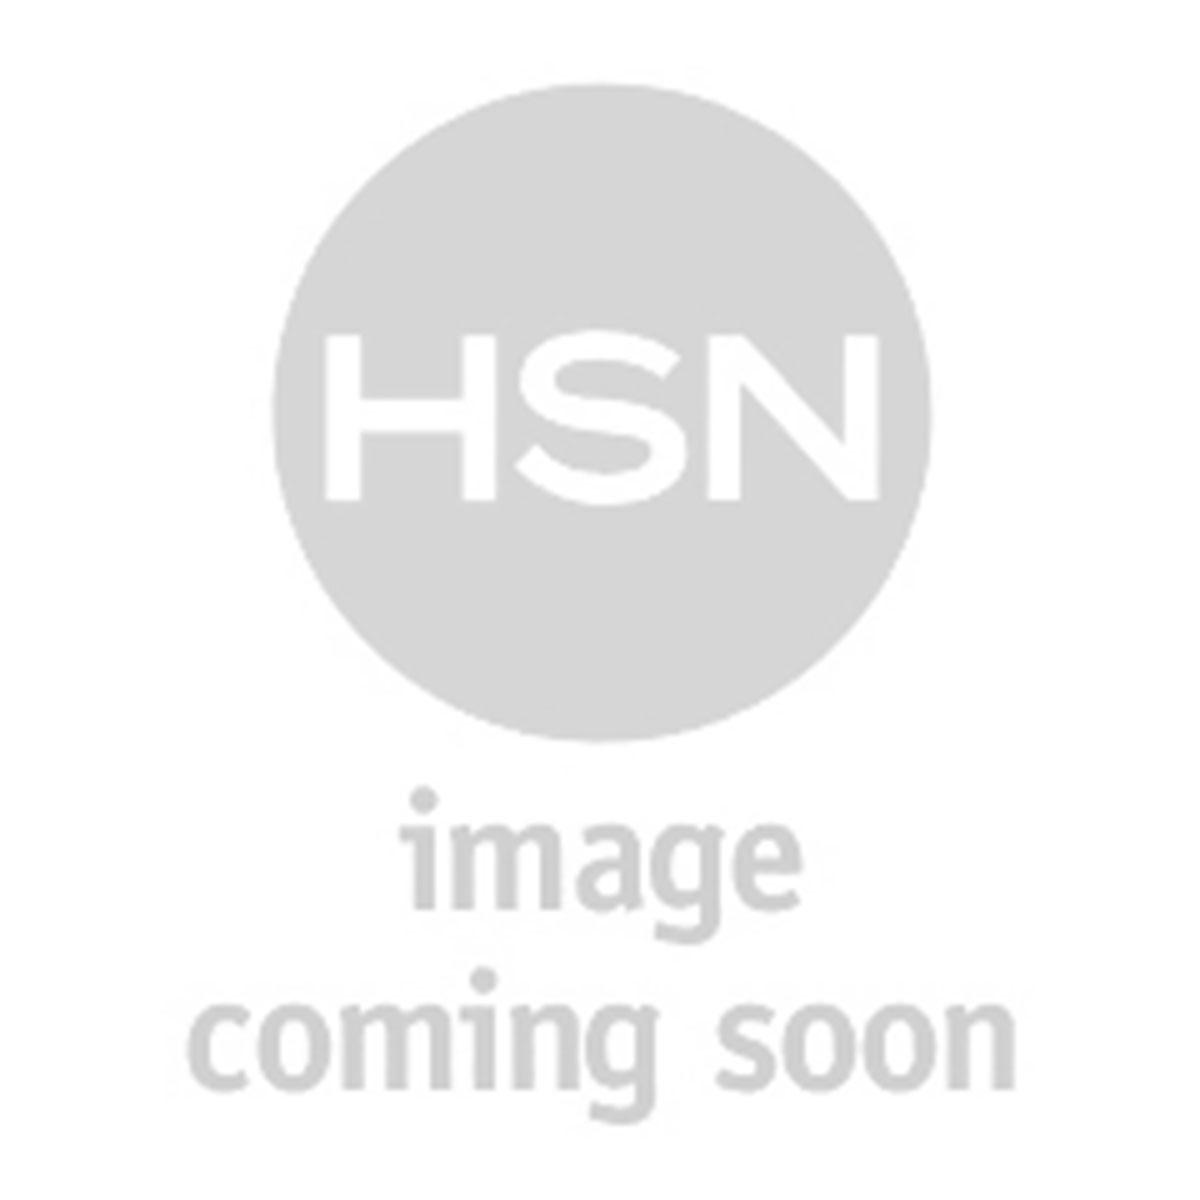 Hudson Square 3 Piece Lounge Set 7813240 Hsn